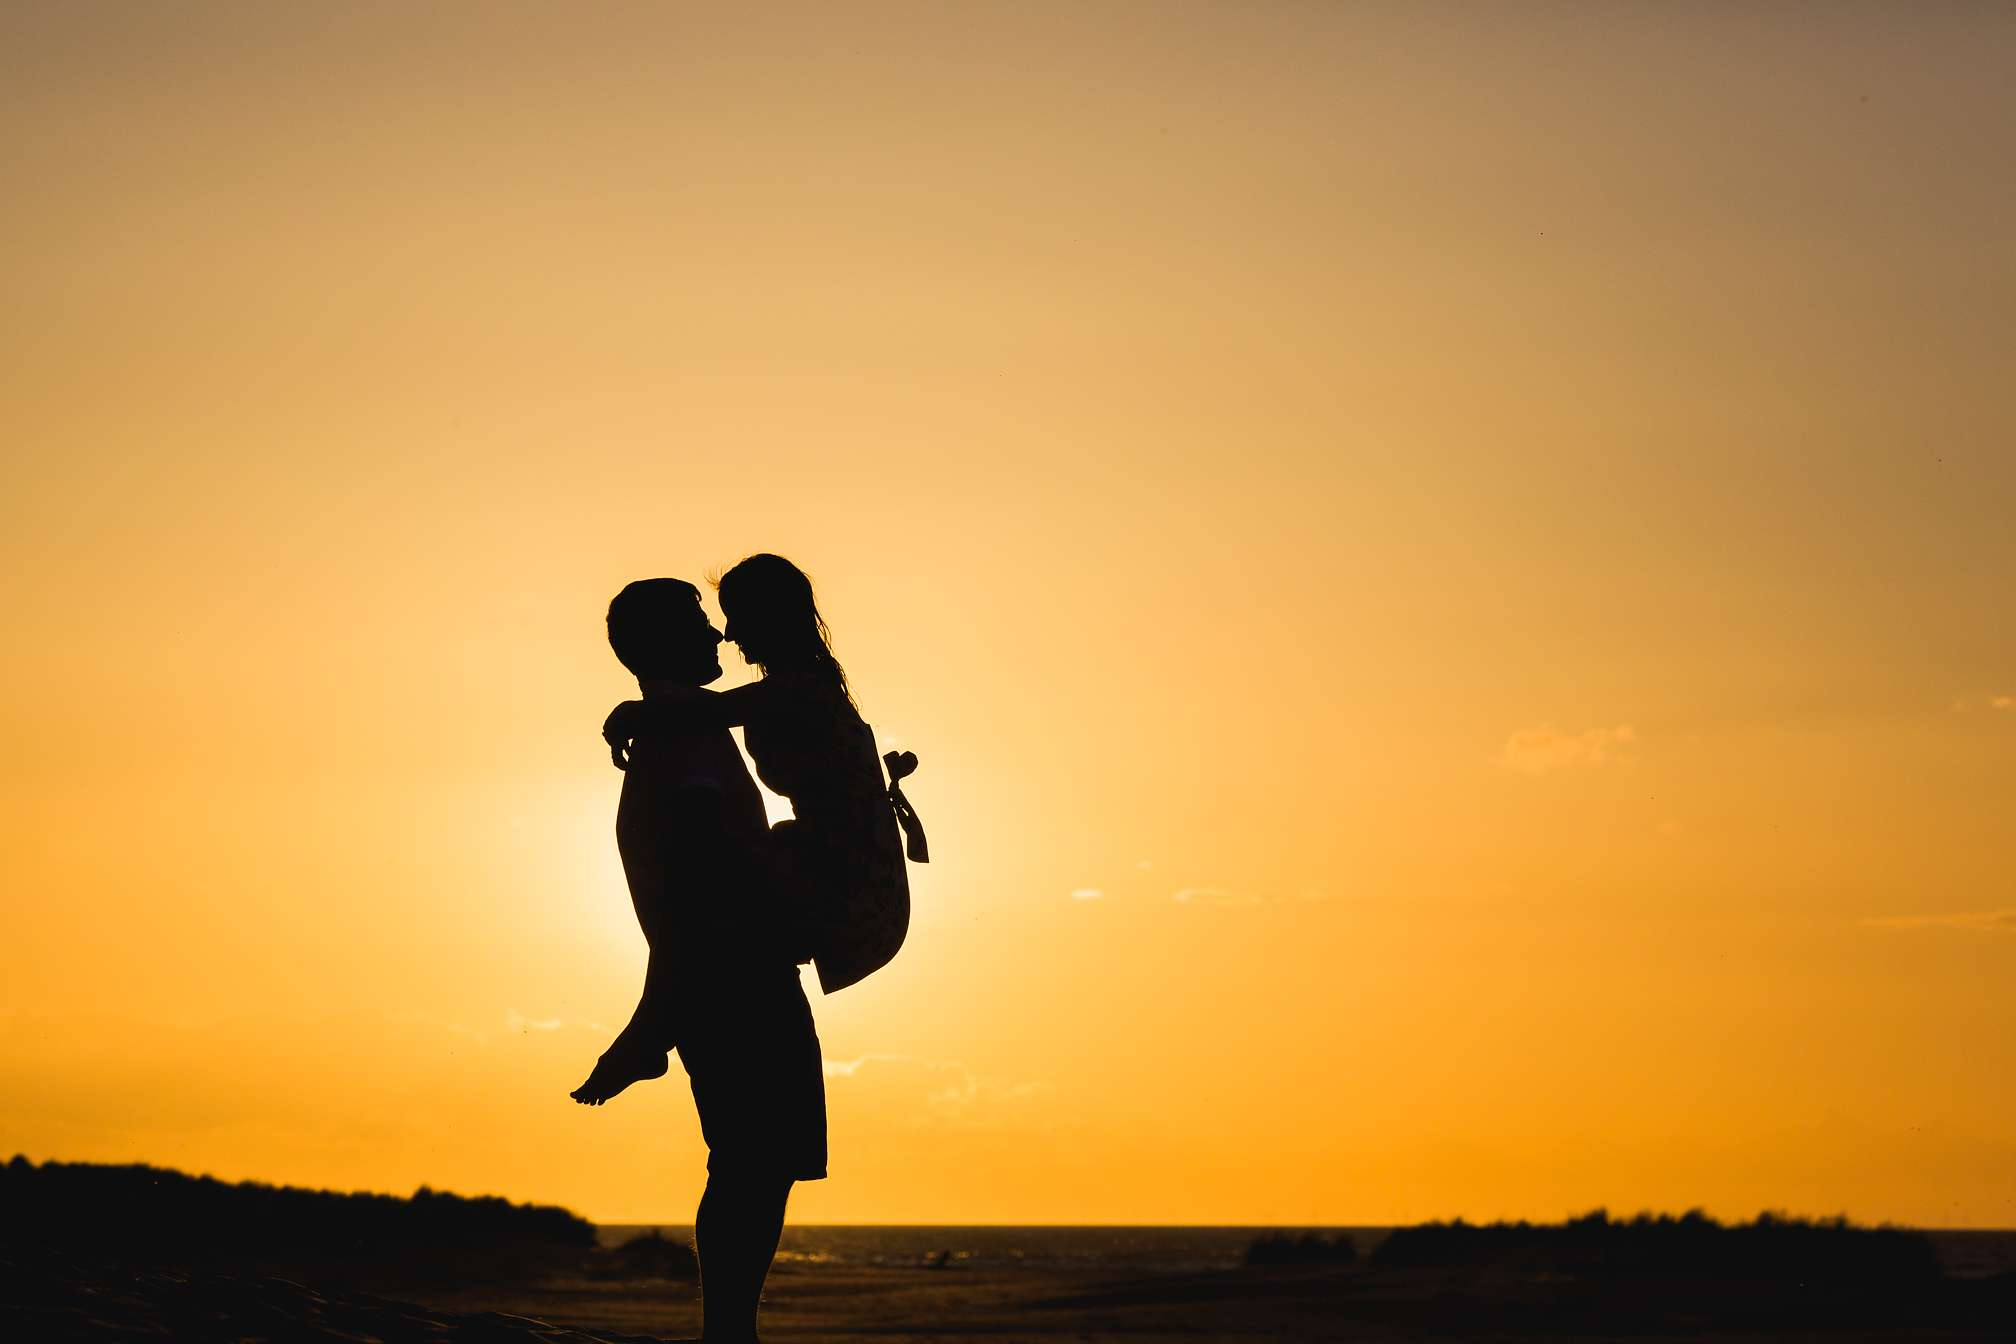 Award winning sunset portrait - Laura and Tim cuddling